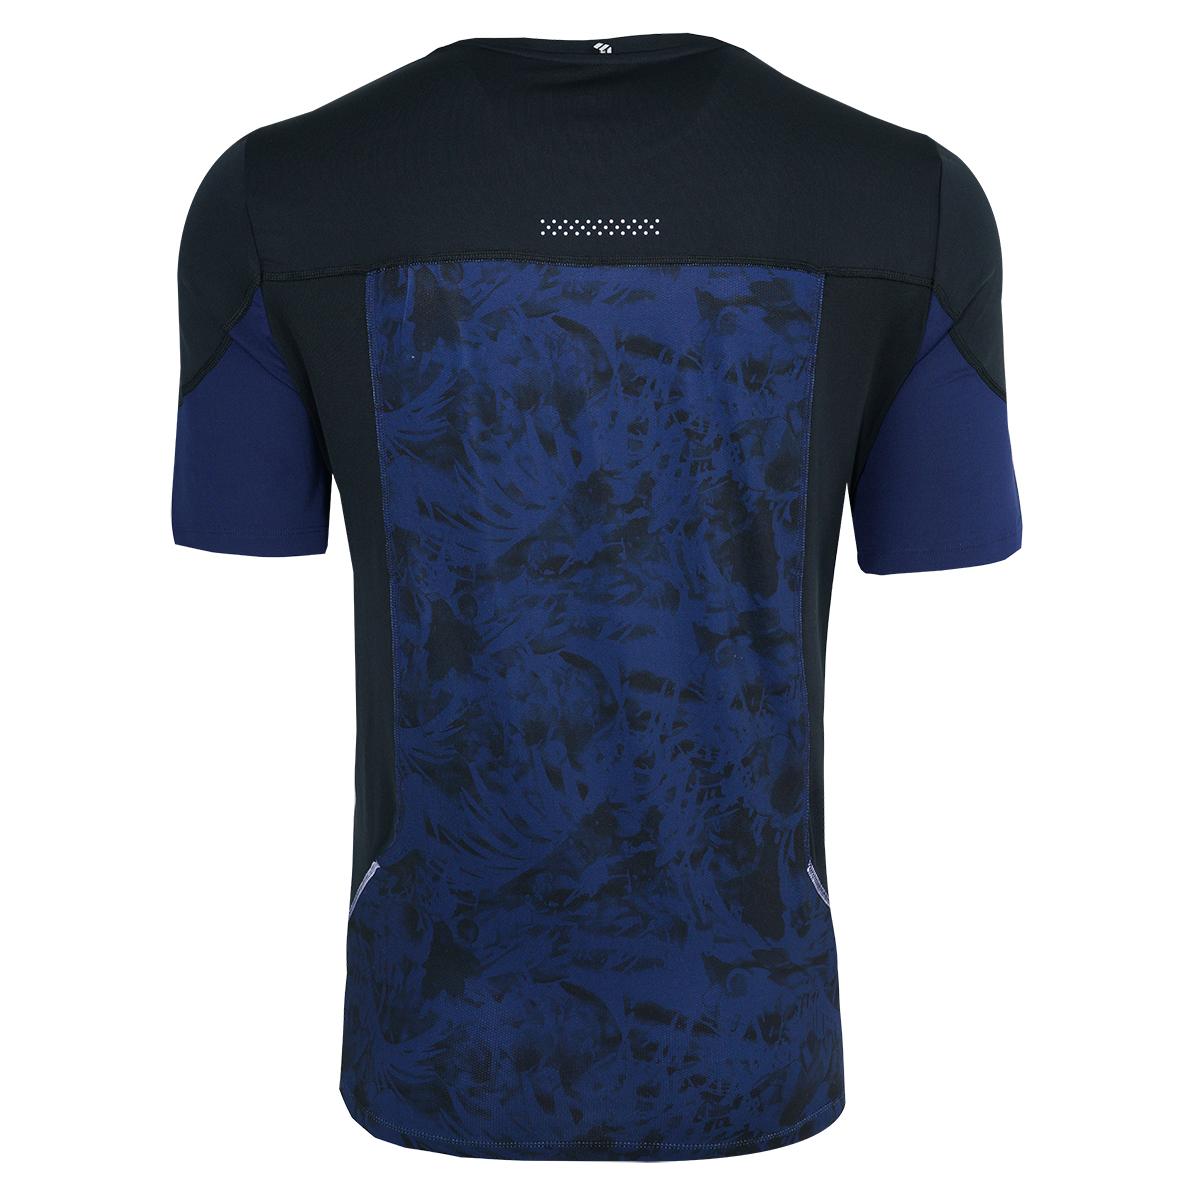 Body-Glove-Men-039-s-Signature-Color-Block-T-Shirt thumbnail 3